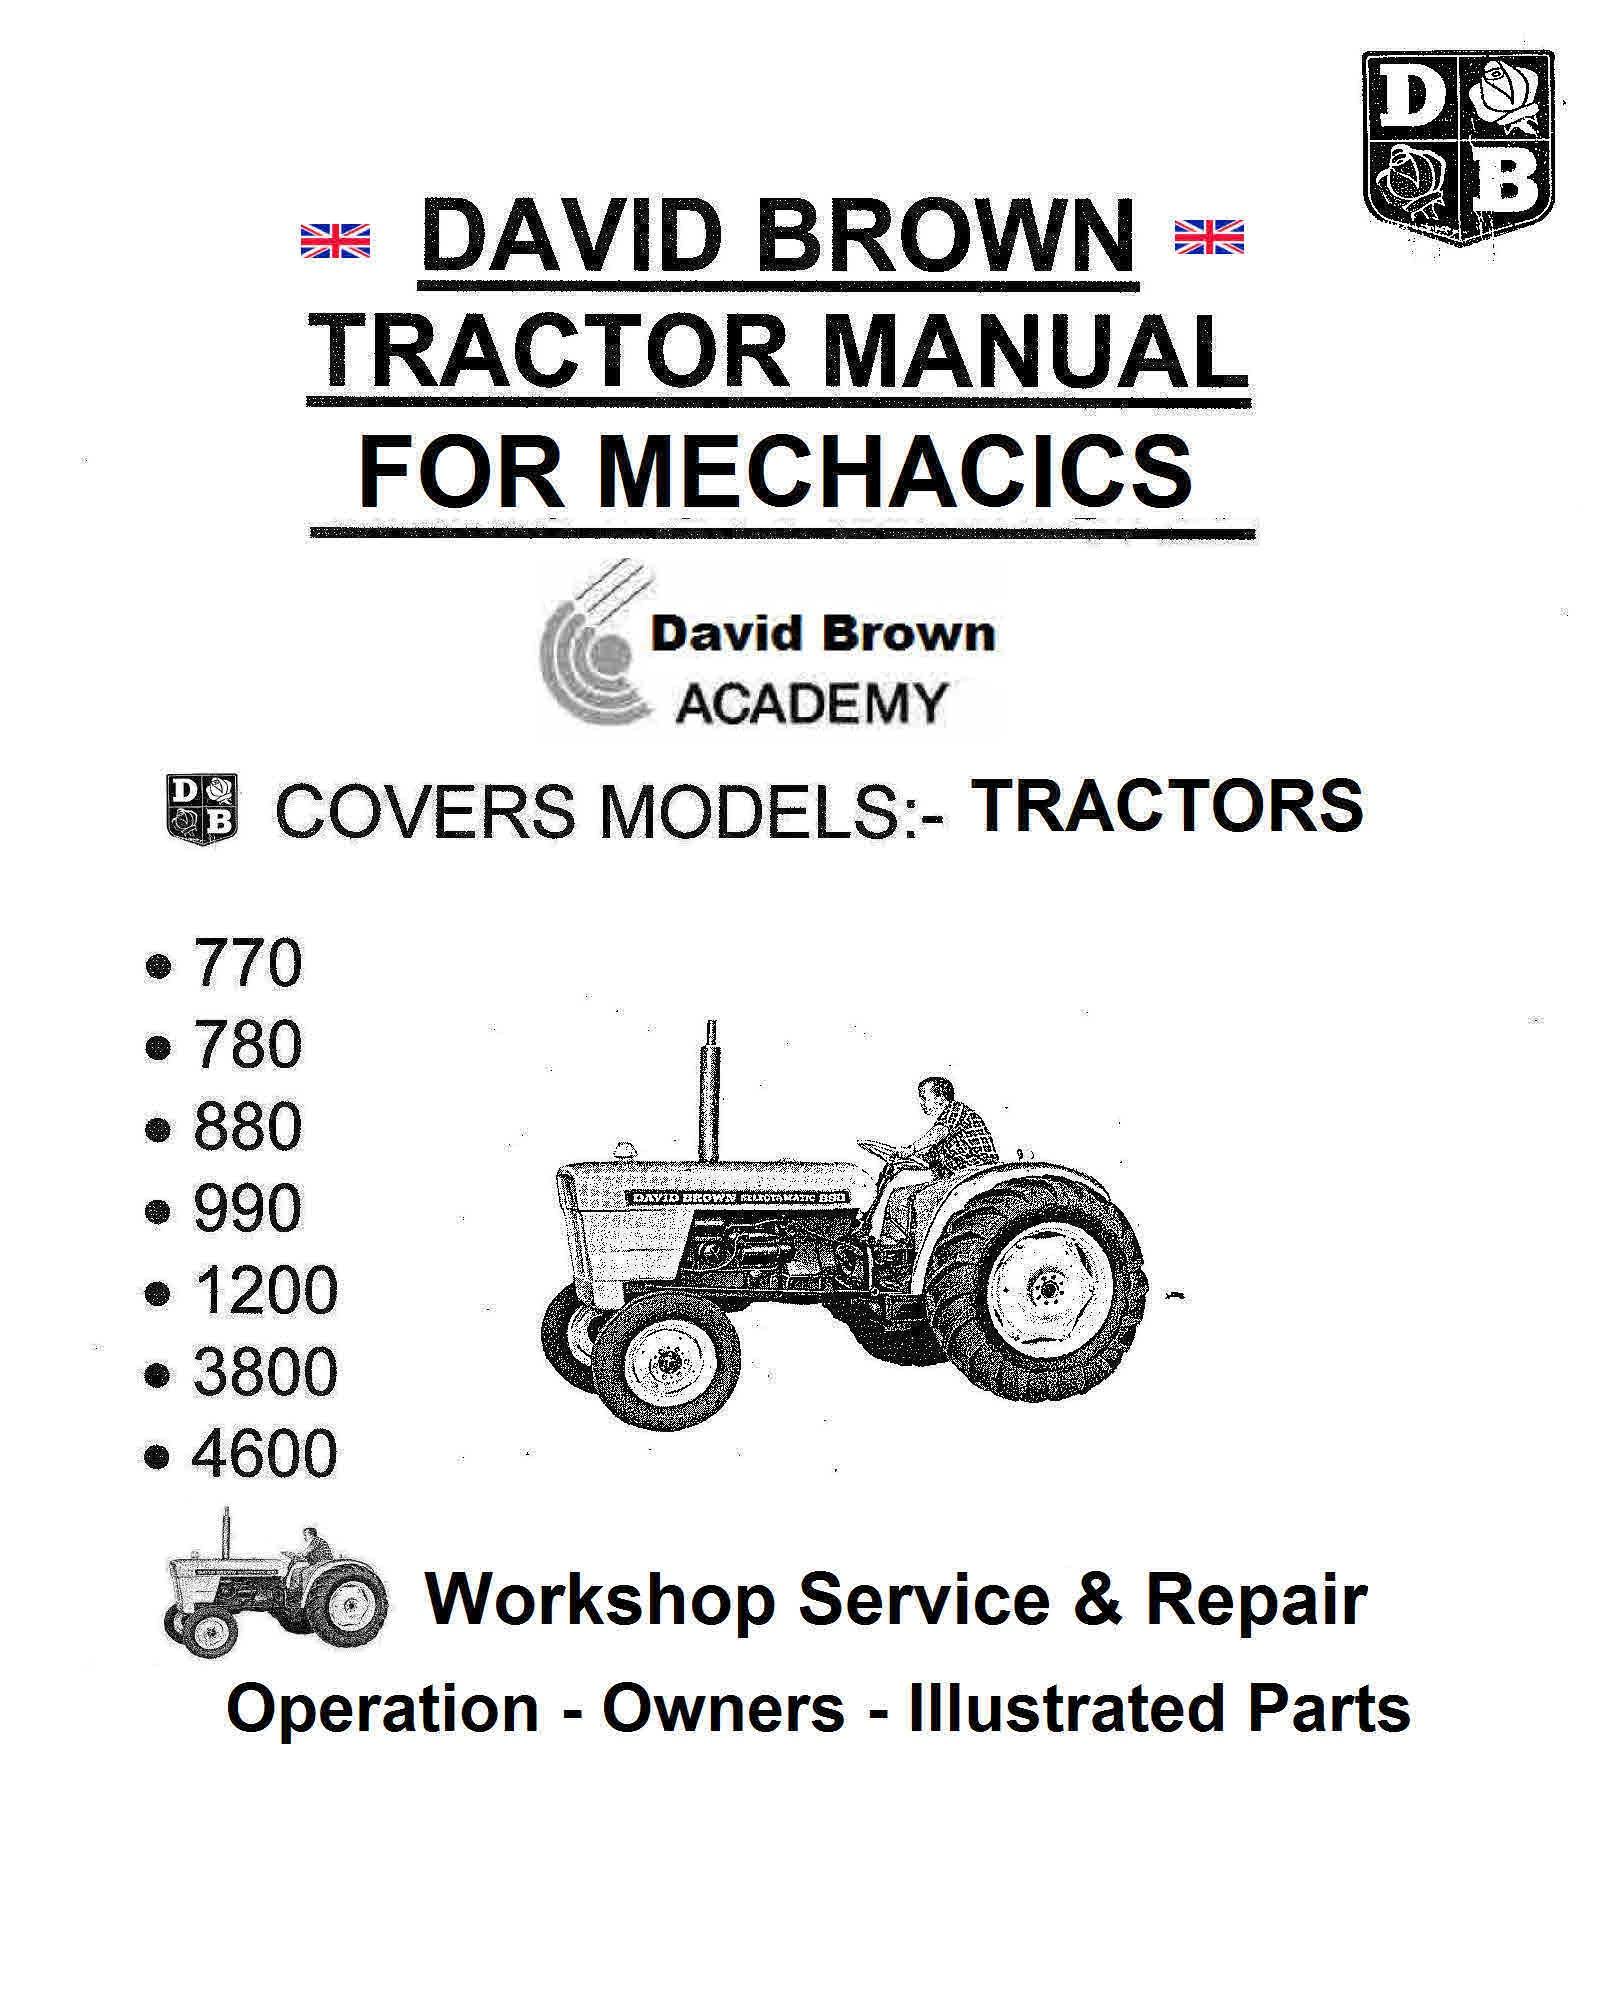 David brown 770 Service manual on